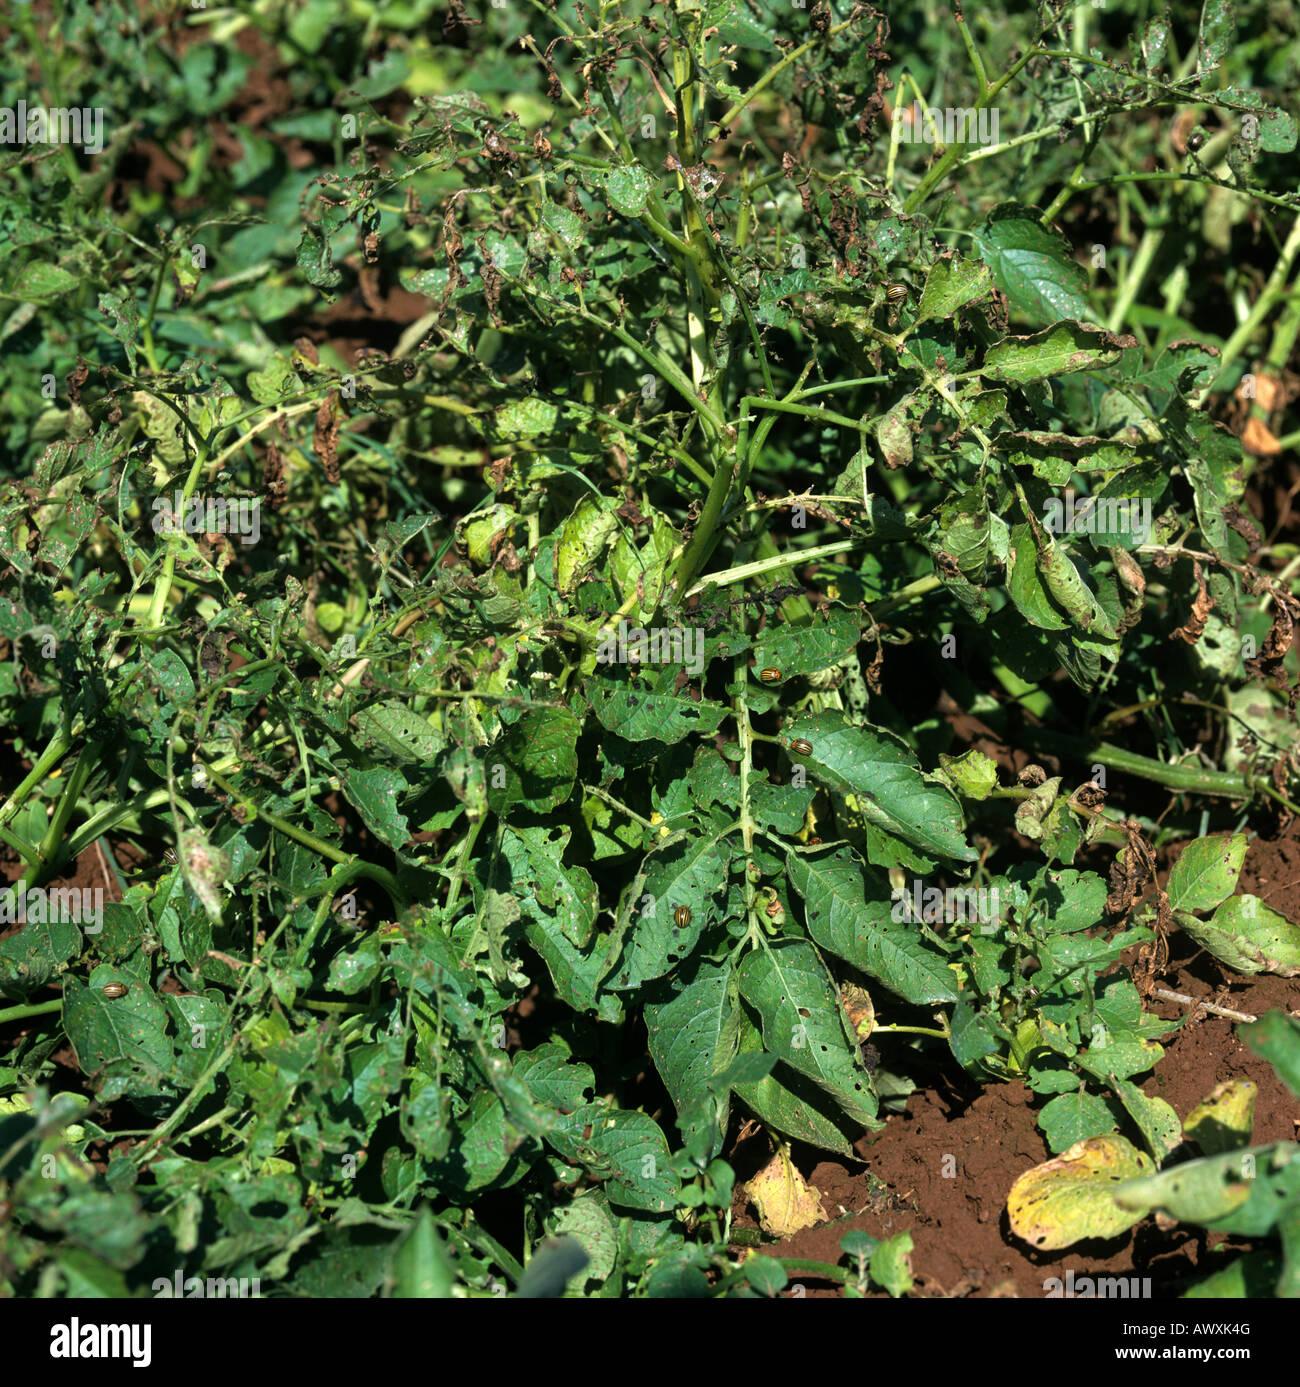 Colorado beetle Leptinotarsa decemlineata potato plant damage by adults larvae - Stock Image